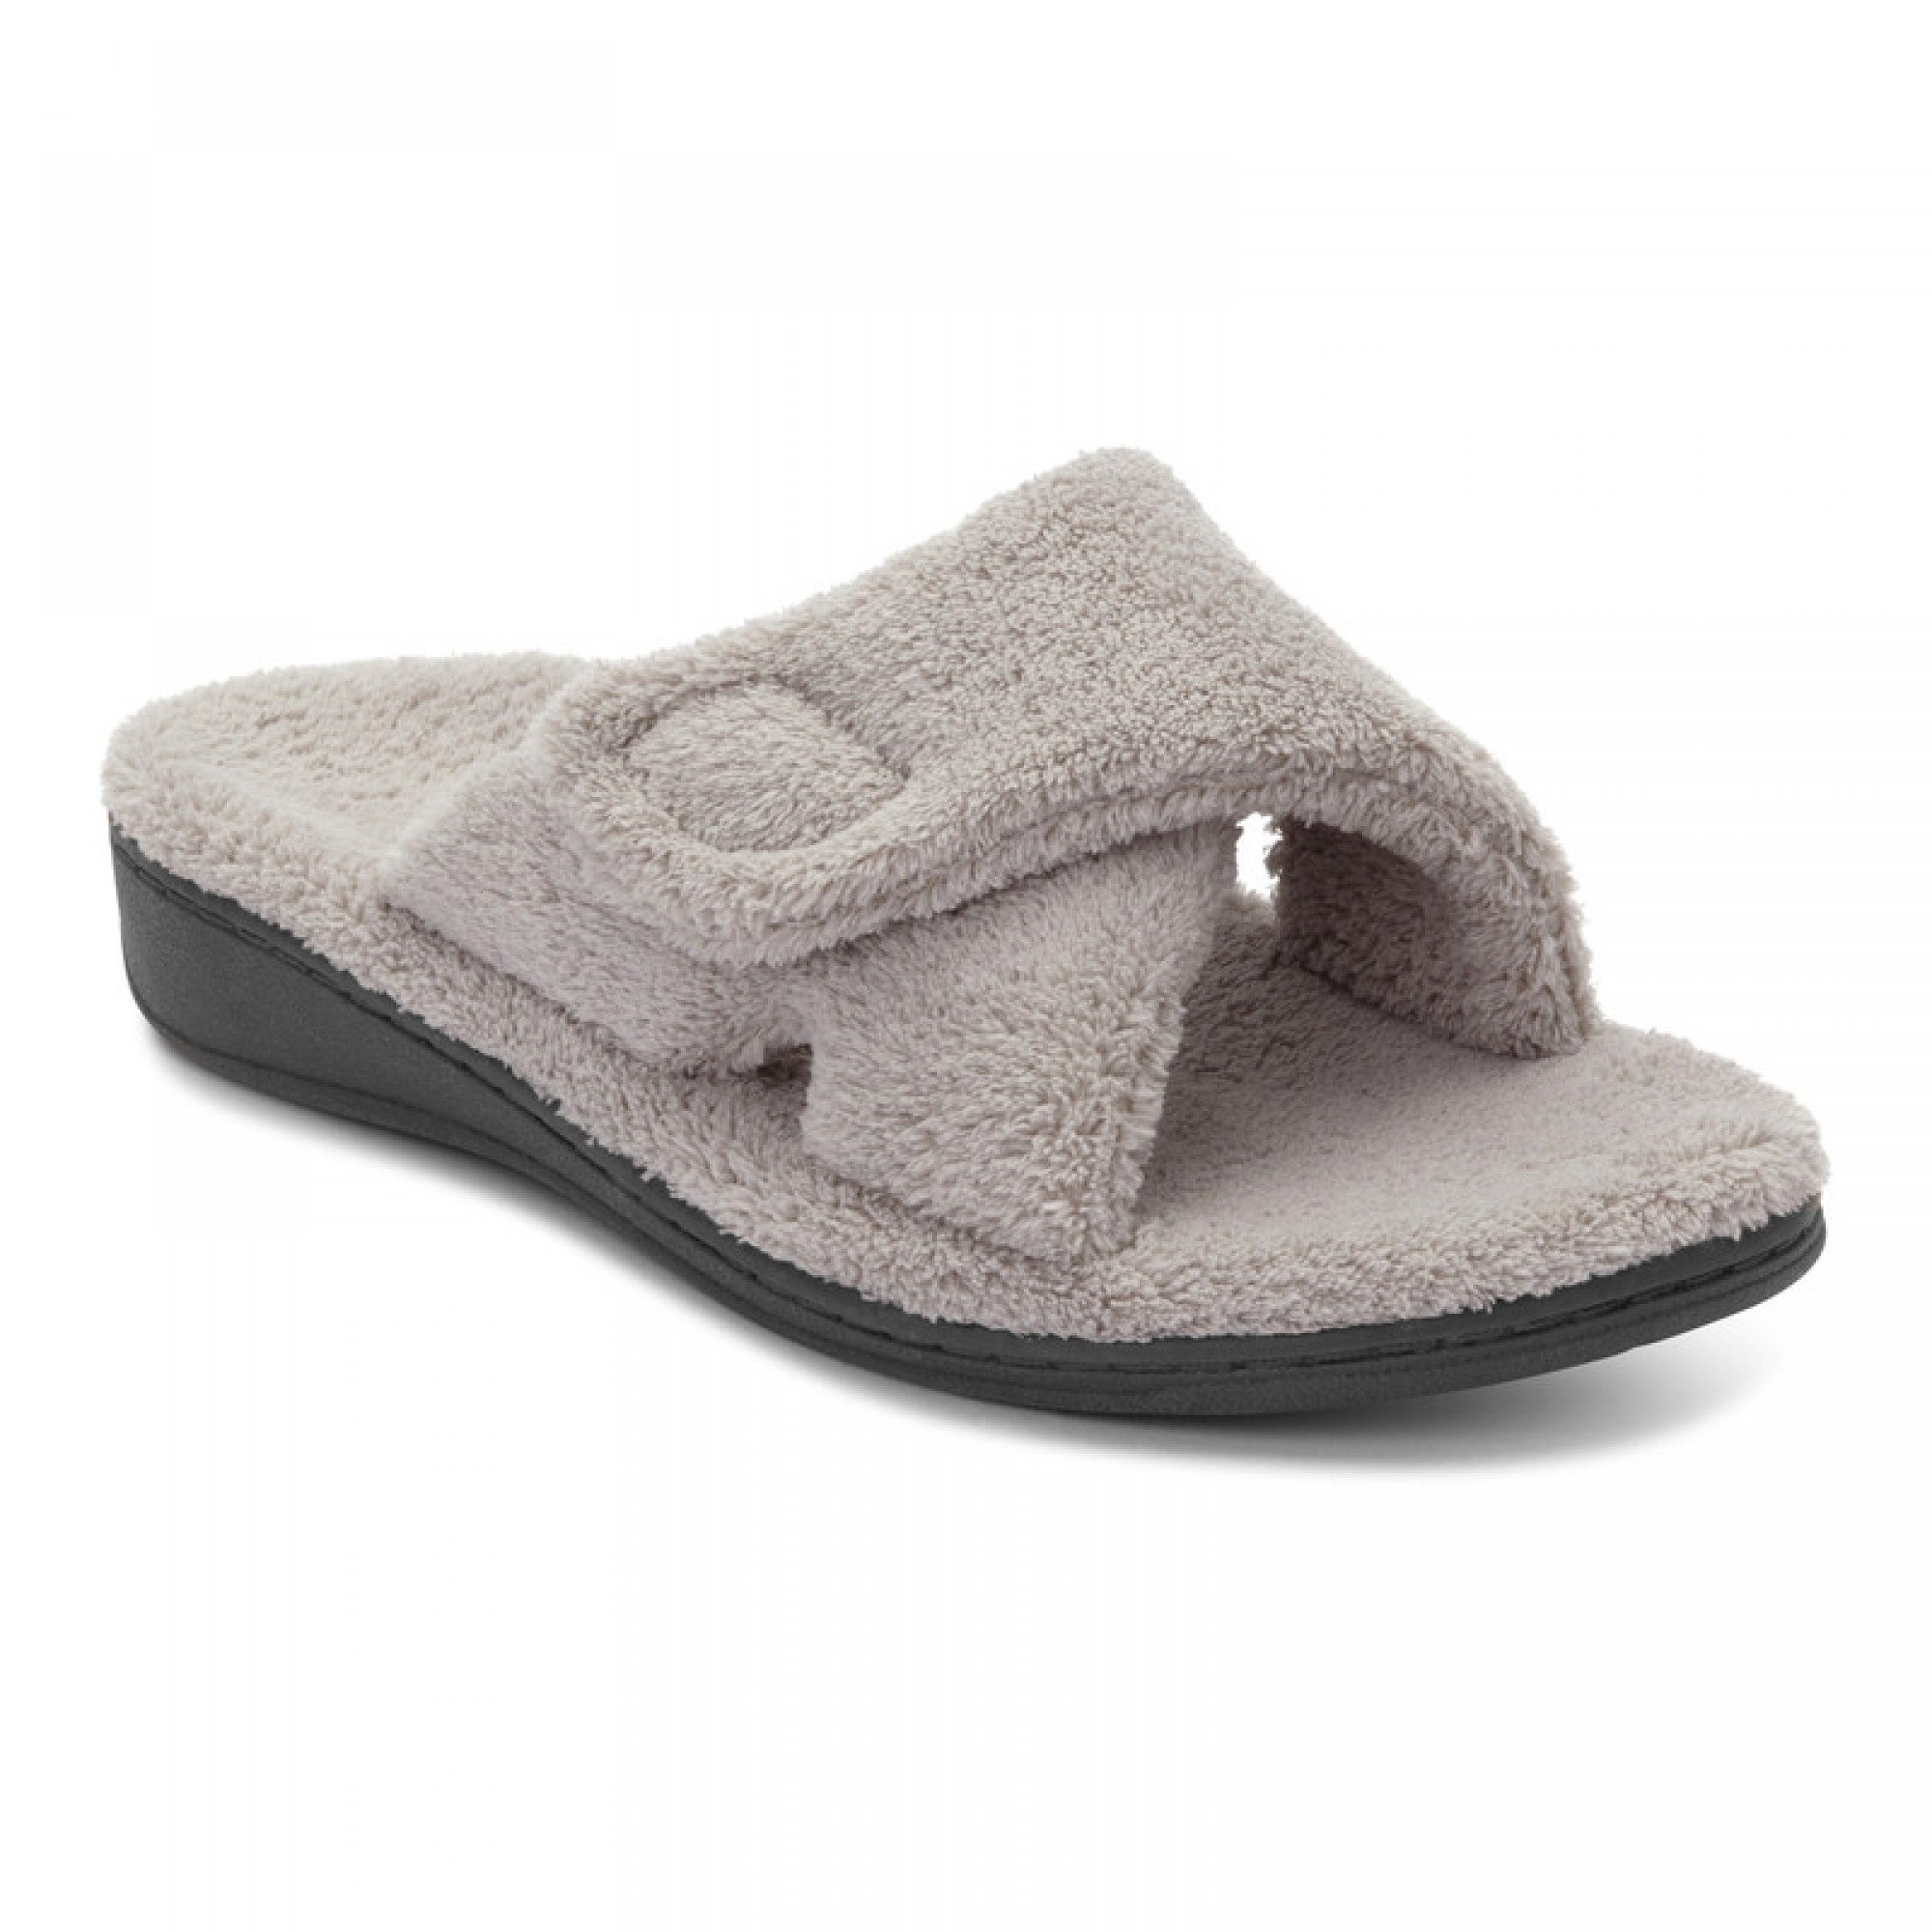 Vionic Relax Slippers - Women's